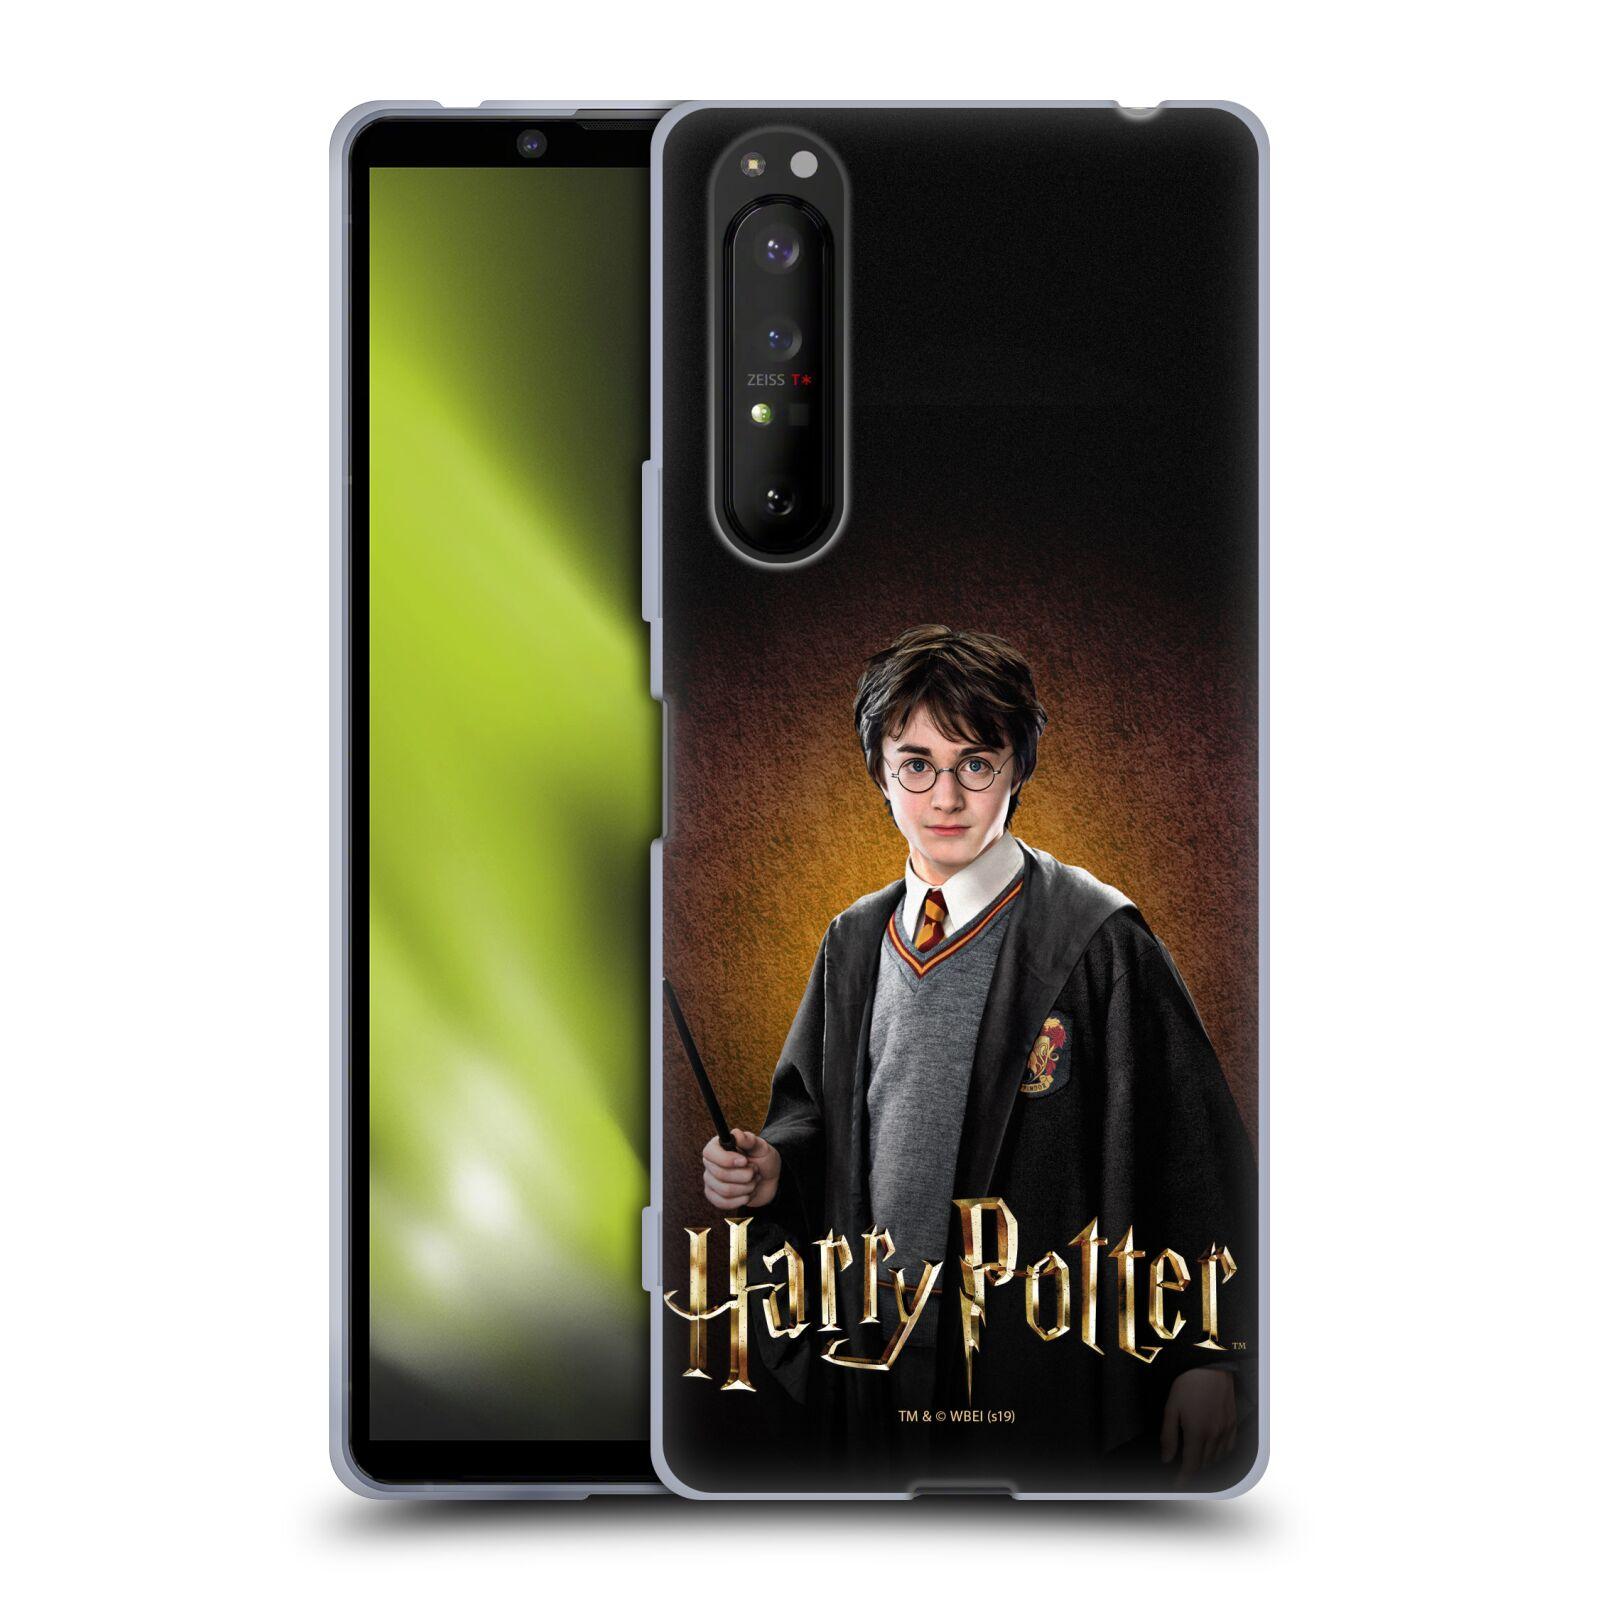 Silikonové pouzdro na mobil Sony Xperia 1 II - Harry Potter - Malý Harry Potter